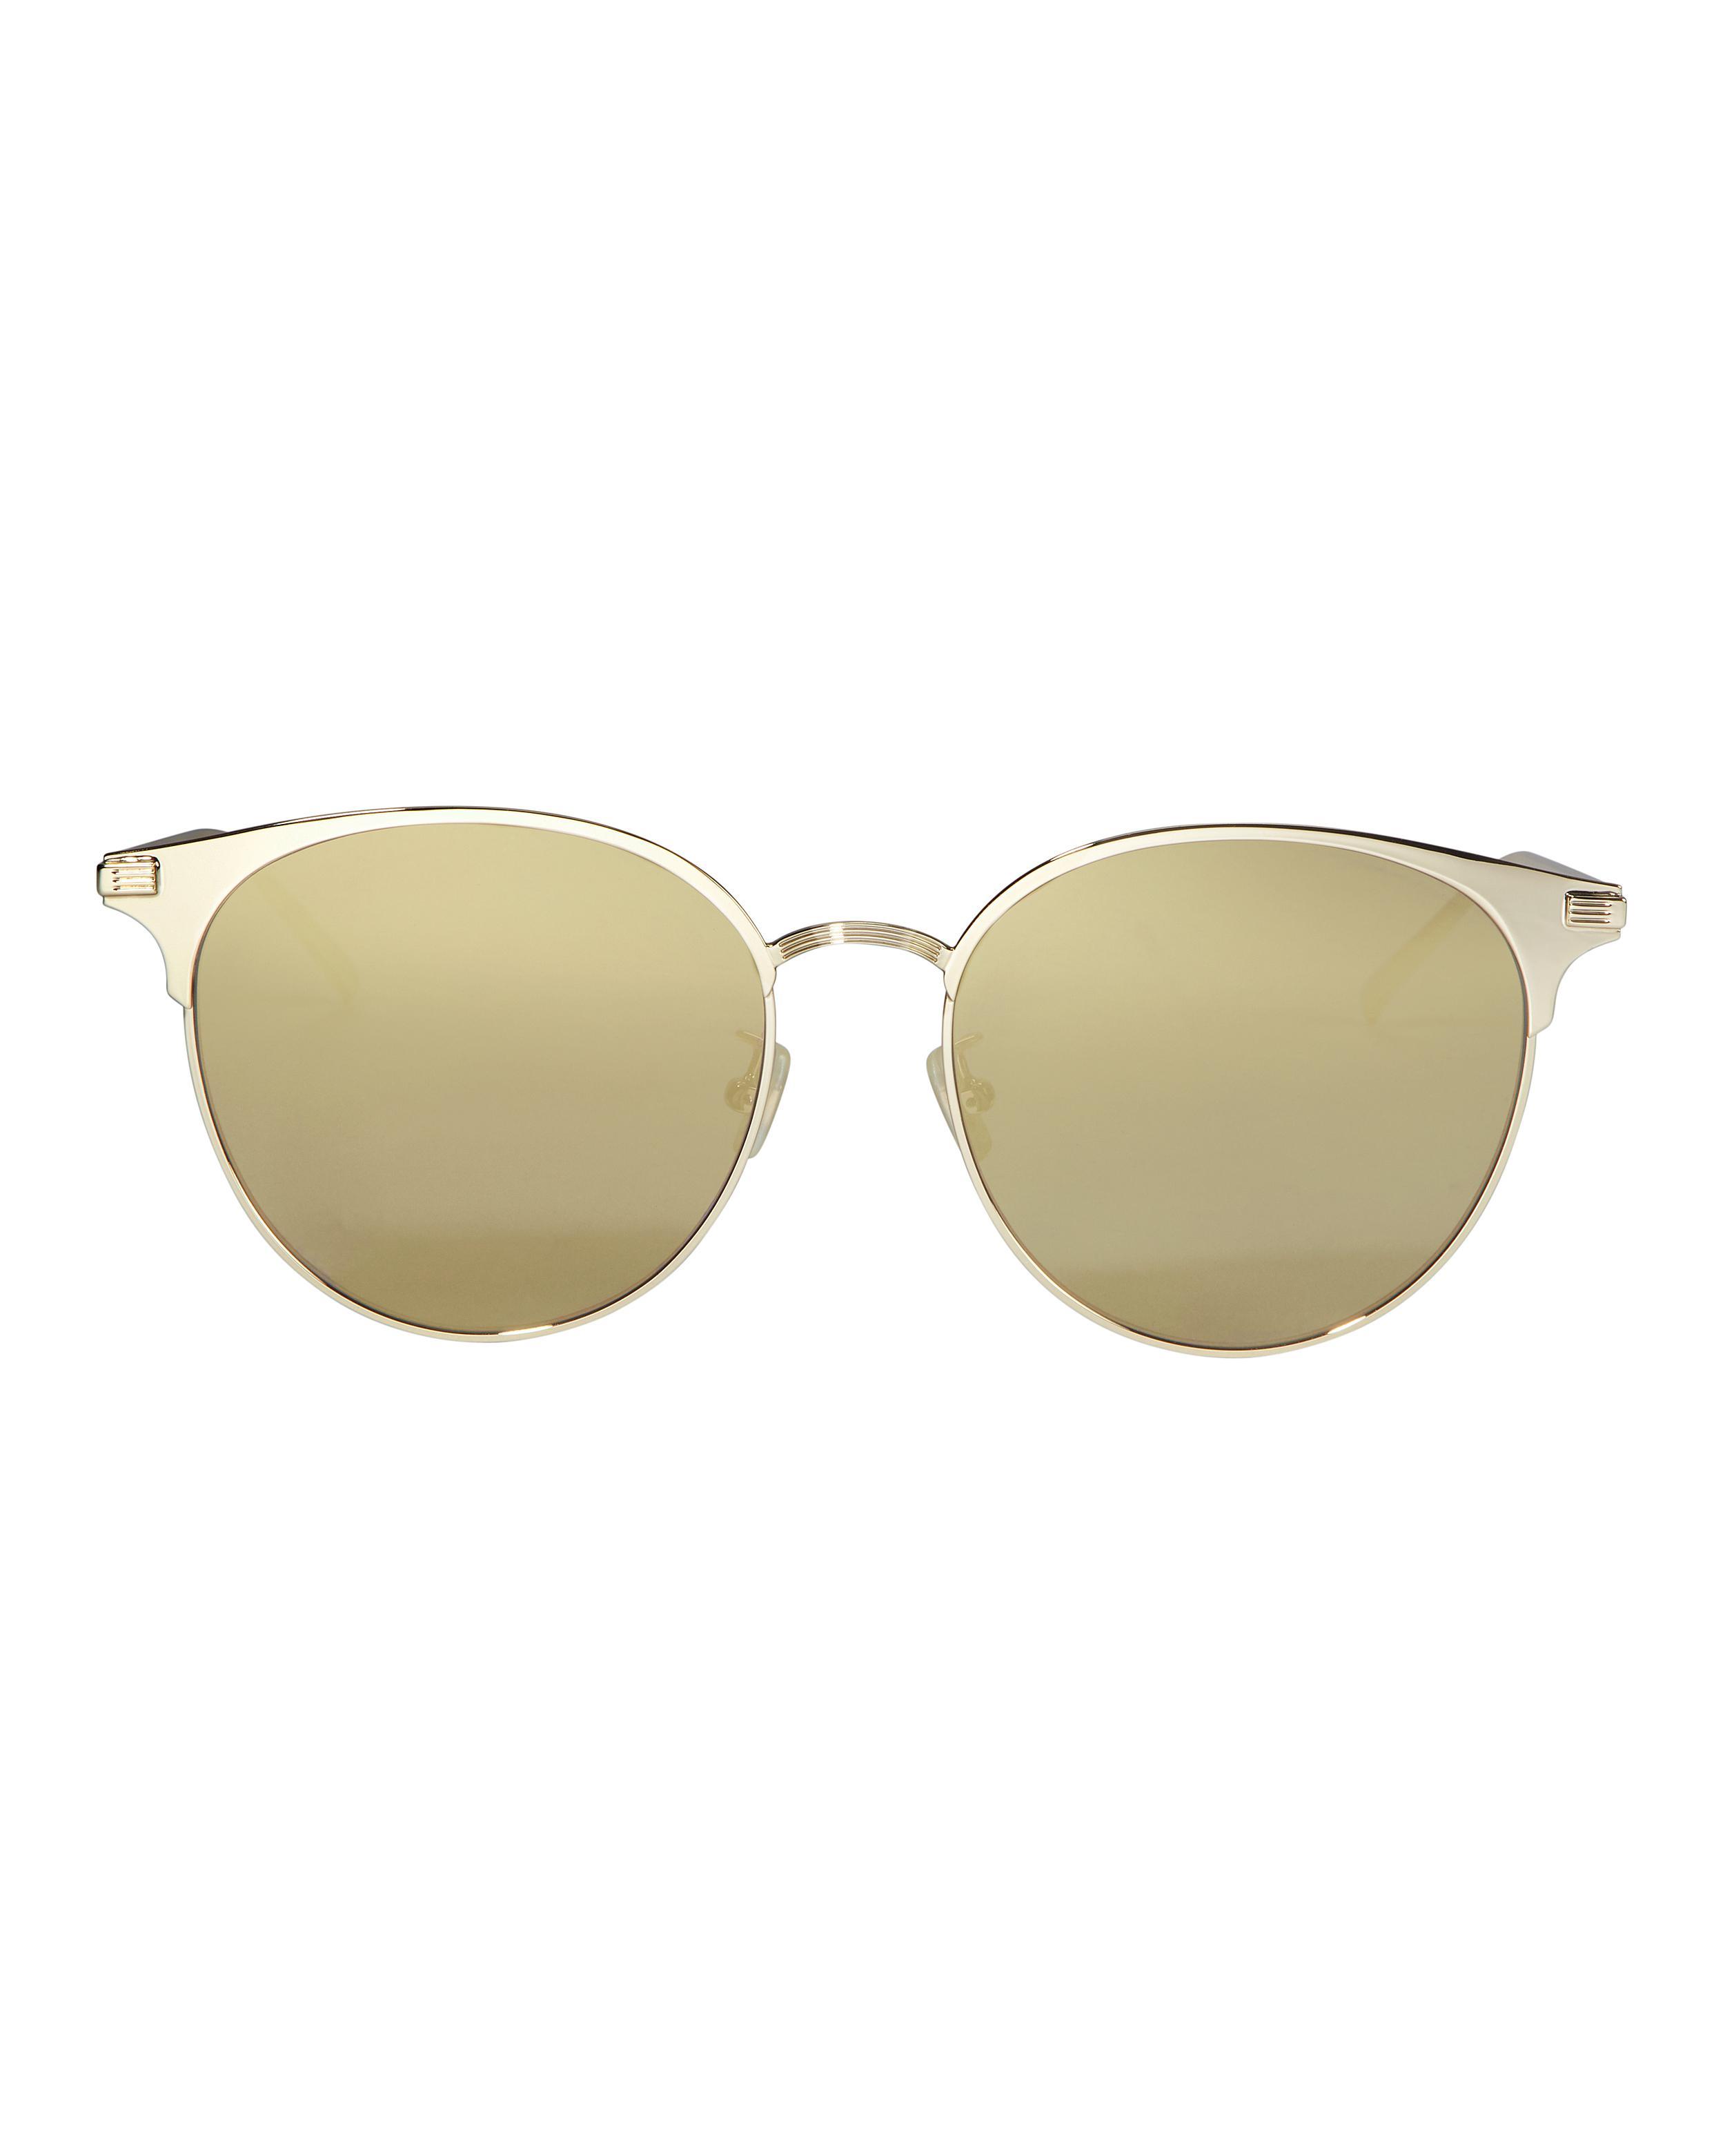 e06a8f2872 Lyst - Saint Laurent Metal Round Sunglasses in Metallic